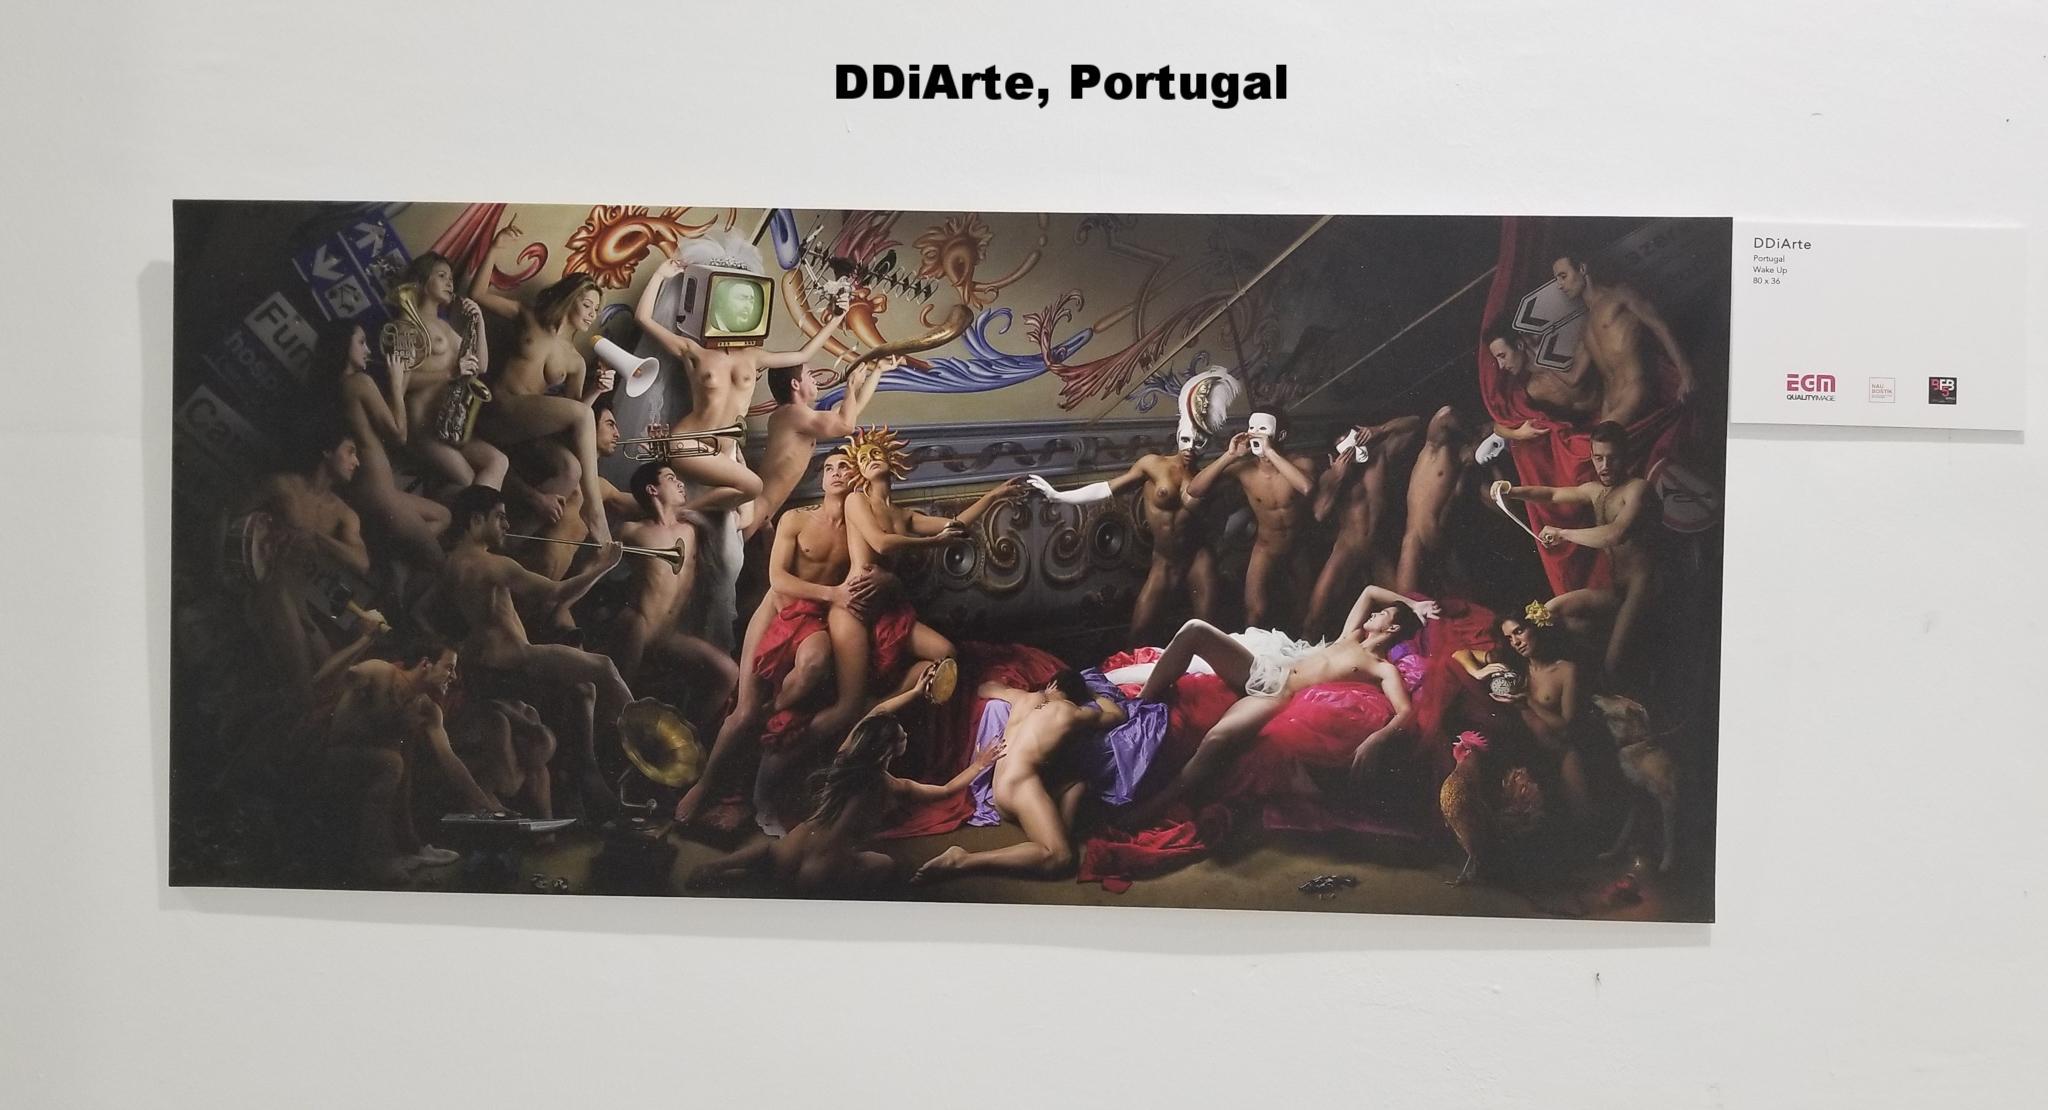 DDiArte, Portugal